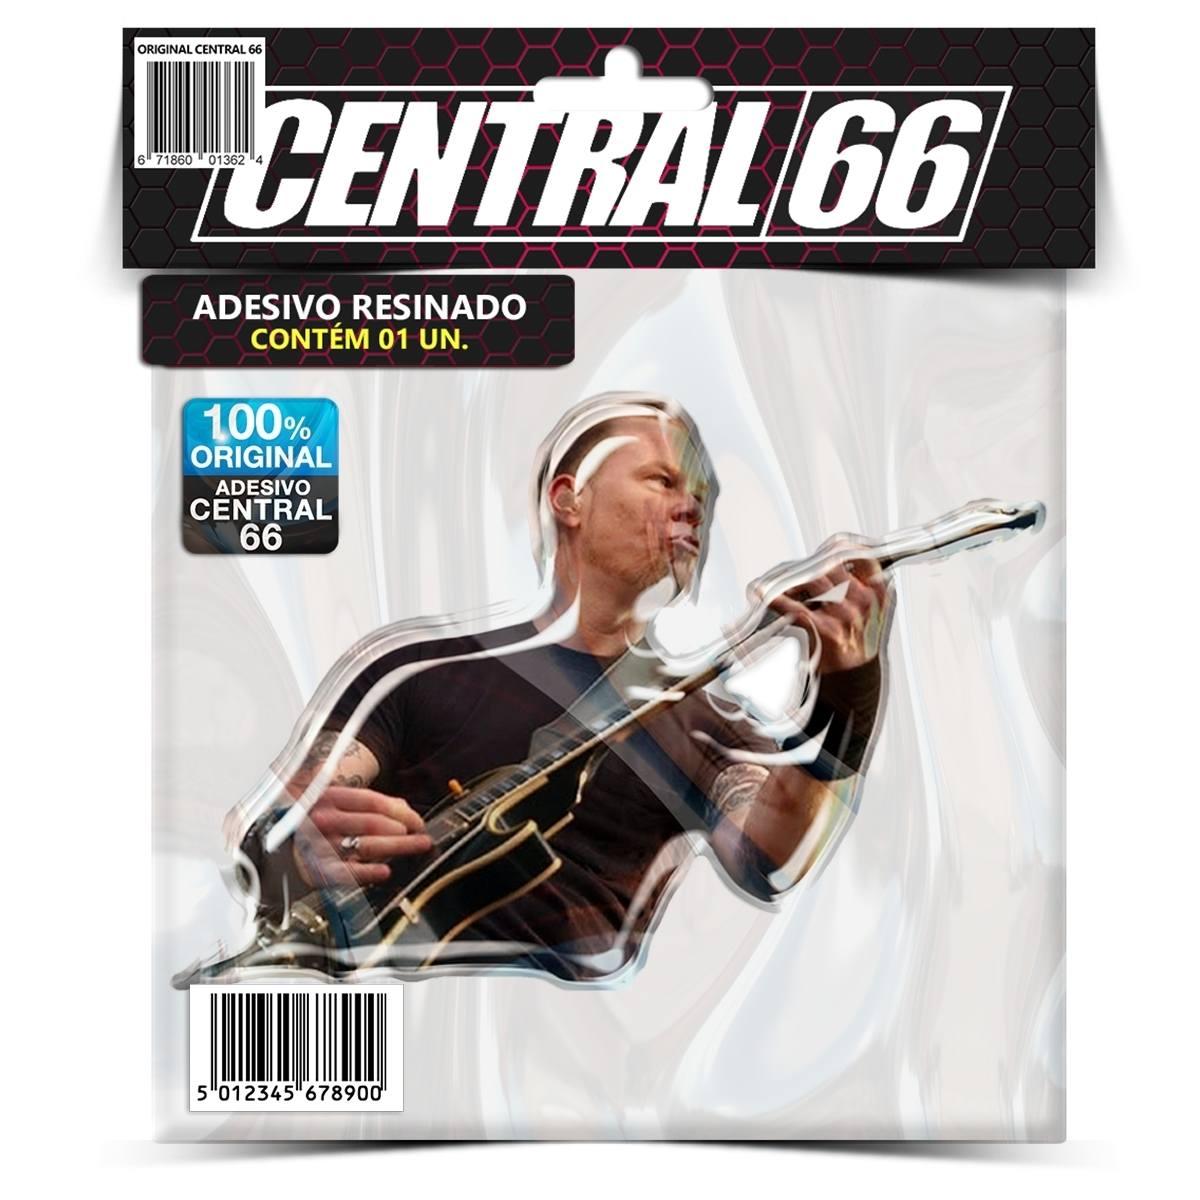 Adesivo James Hatfield Metallica – Central 66